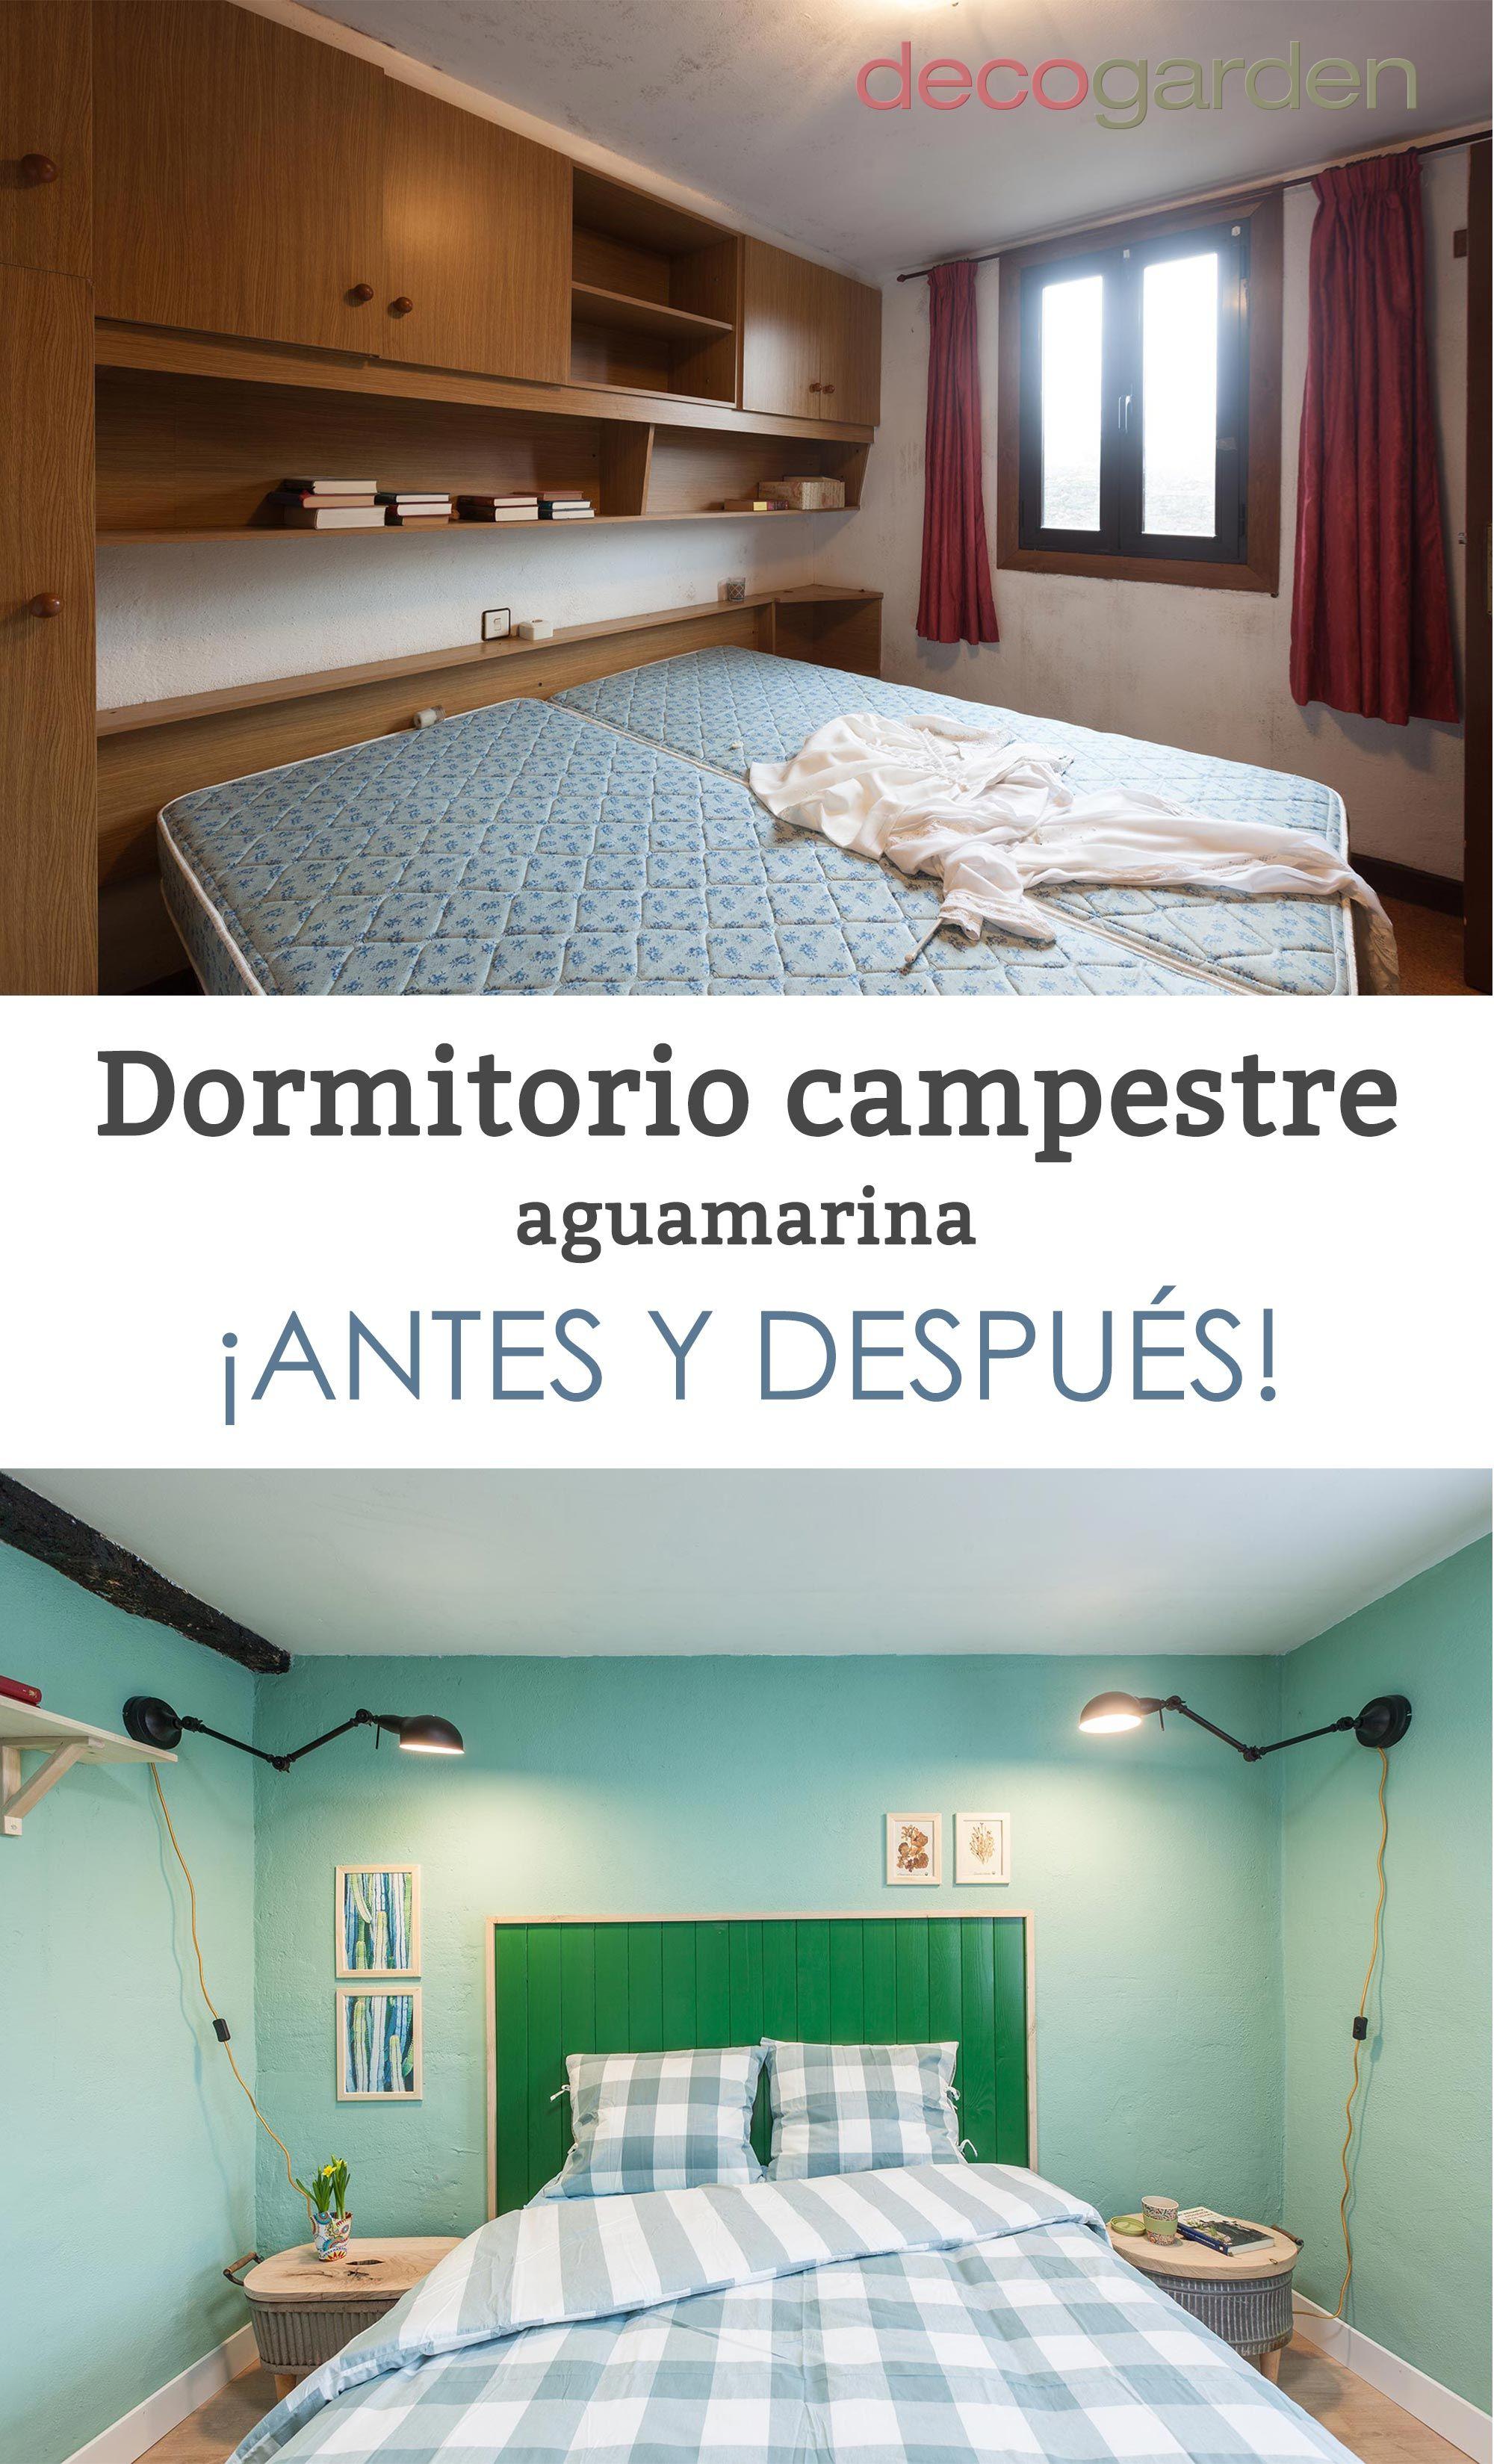 Dormitorio campestre aguamarina